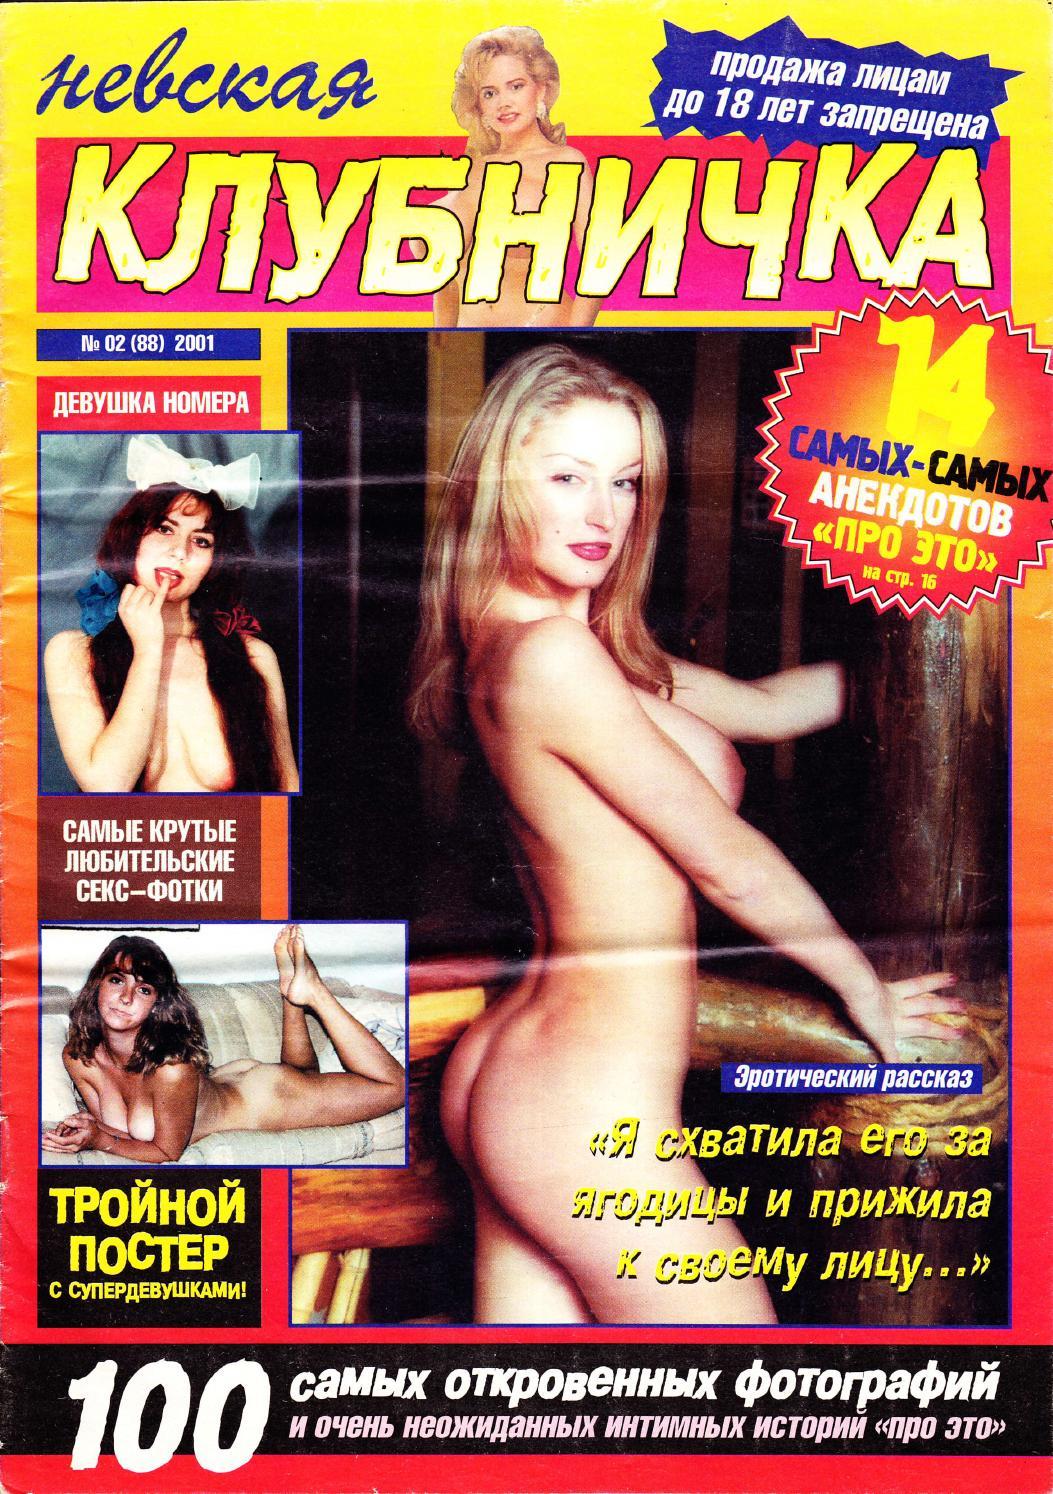 rossiyskie-porno-gazeti-foto-gruppovuha-s-pishkami